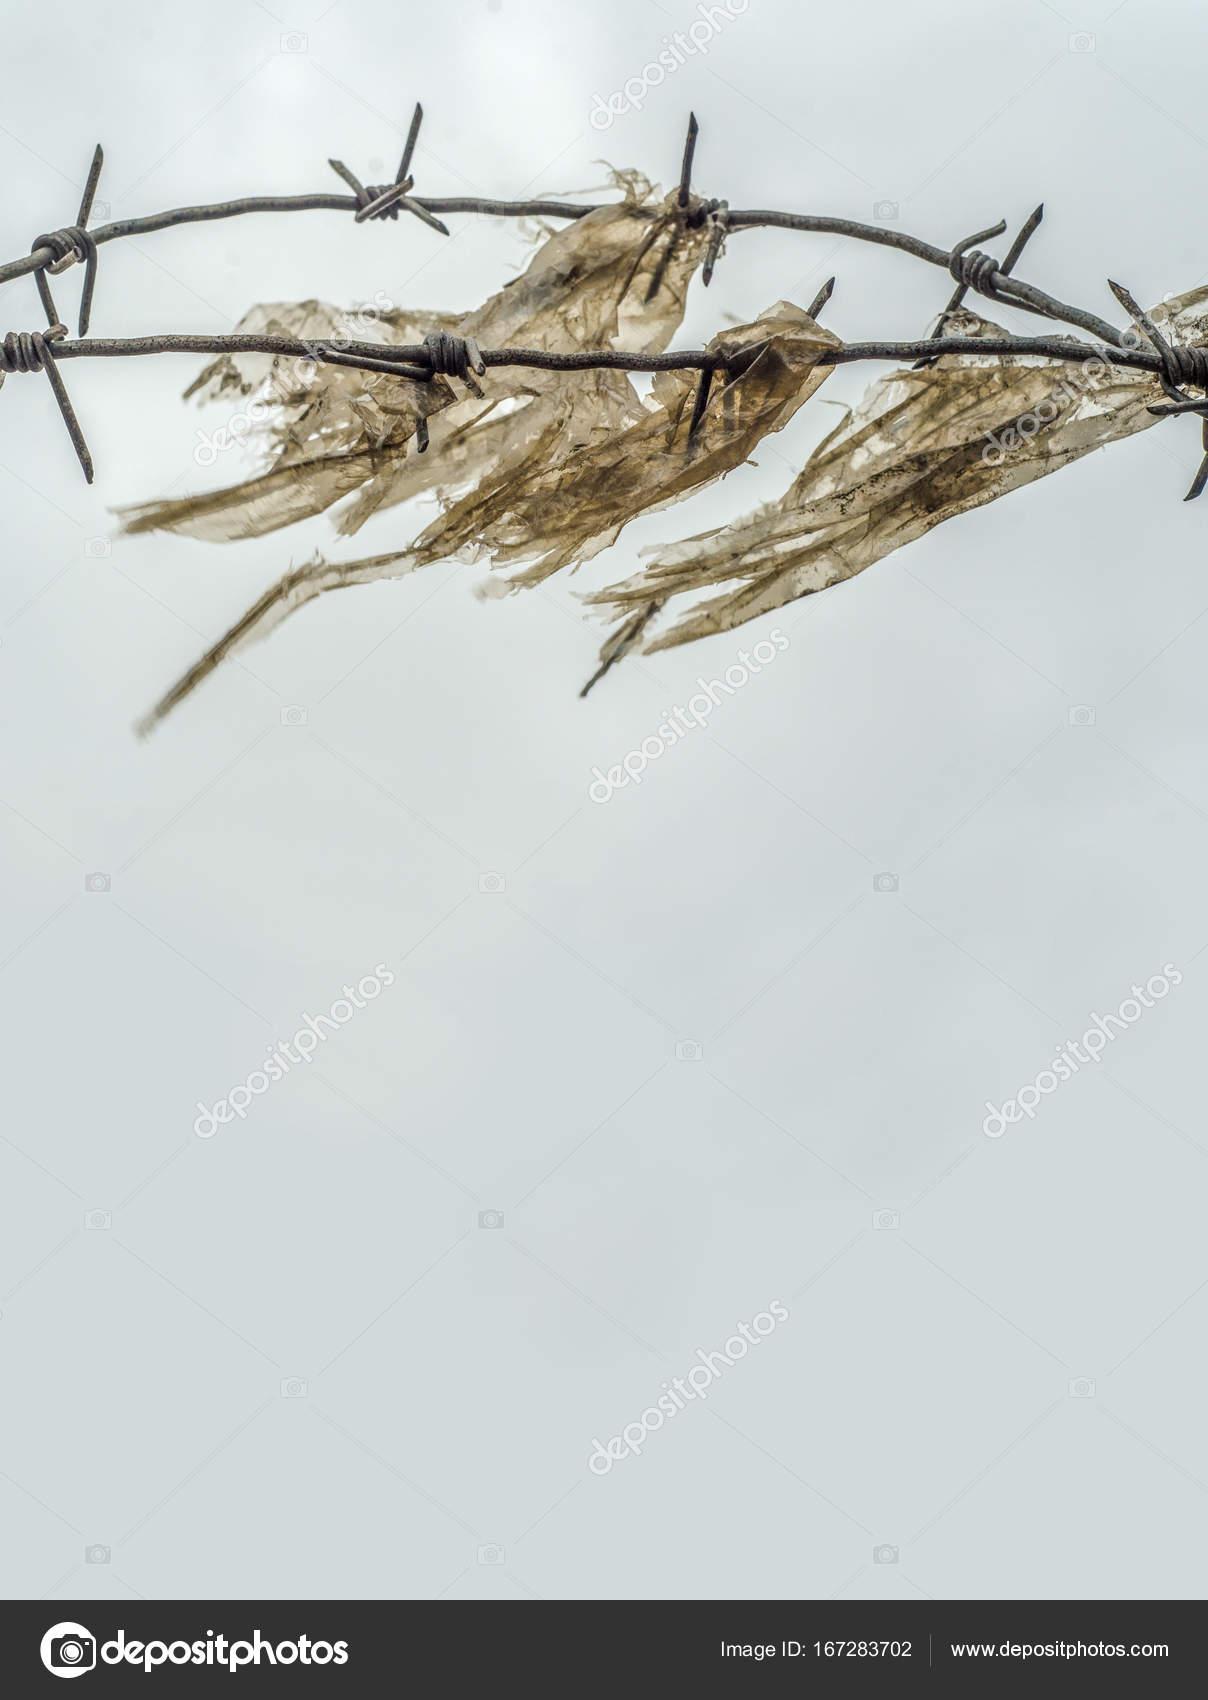 Prison Yard Barb Wire — Stock Photo © mrdoomits #167283702